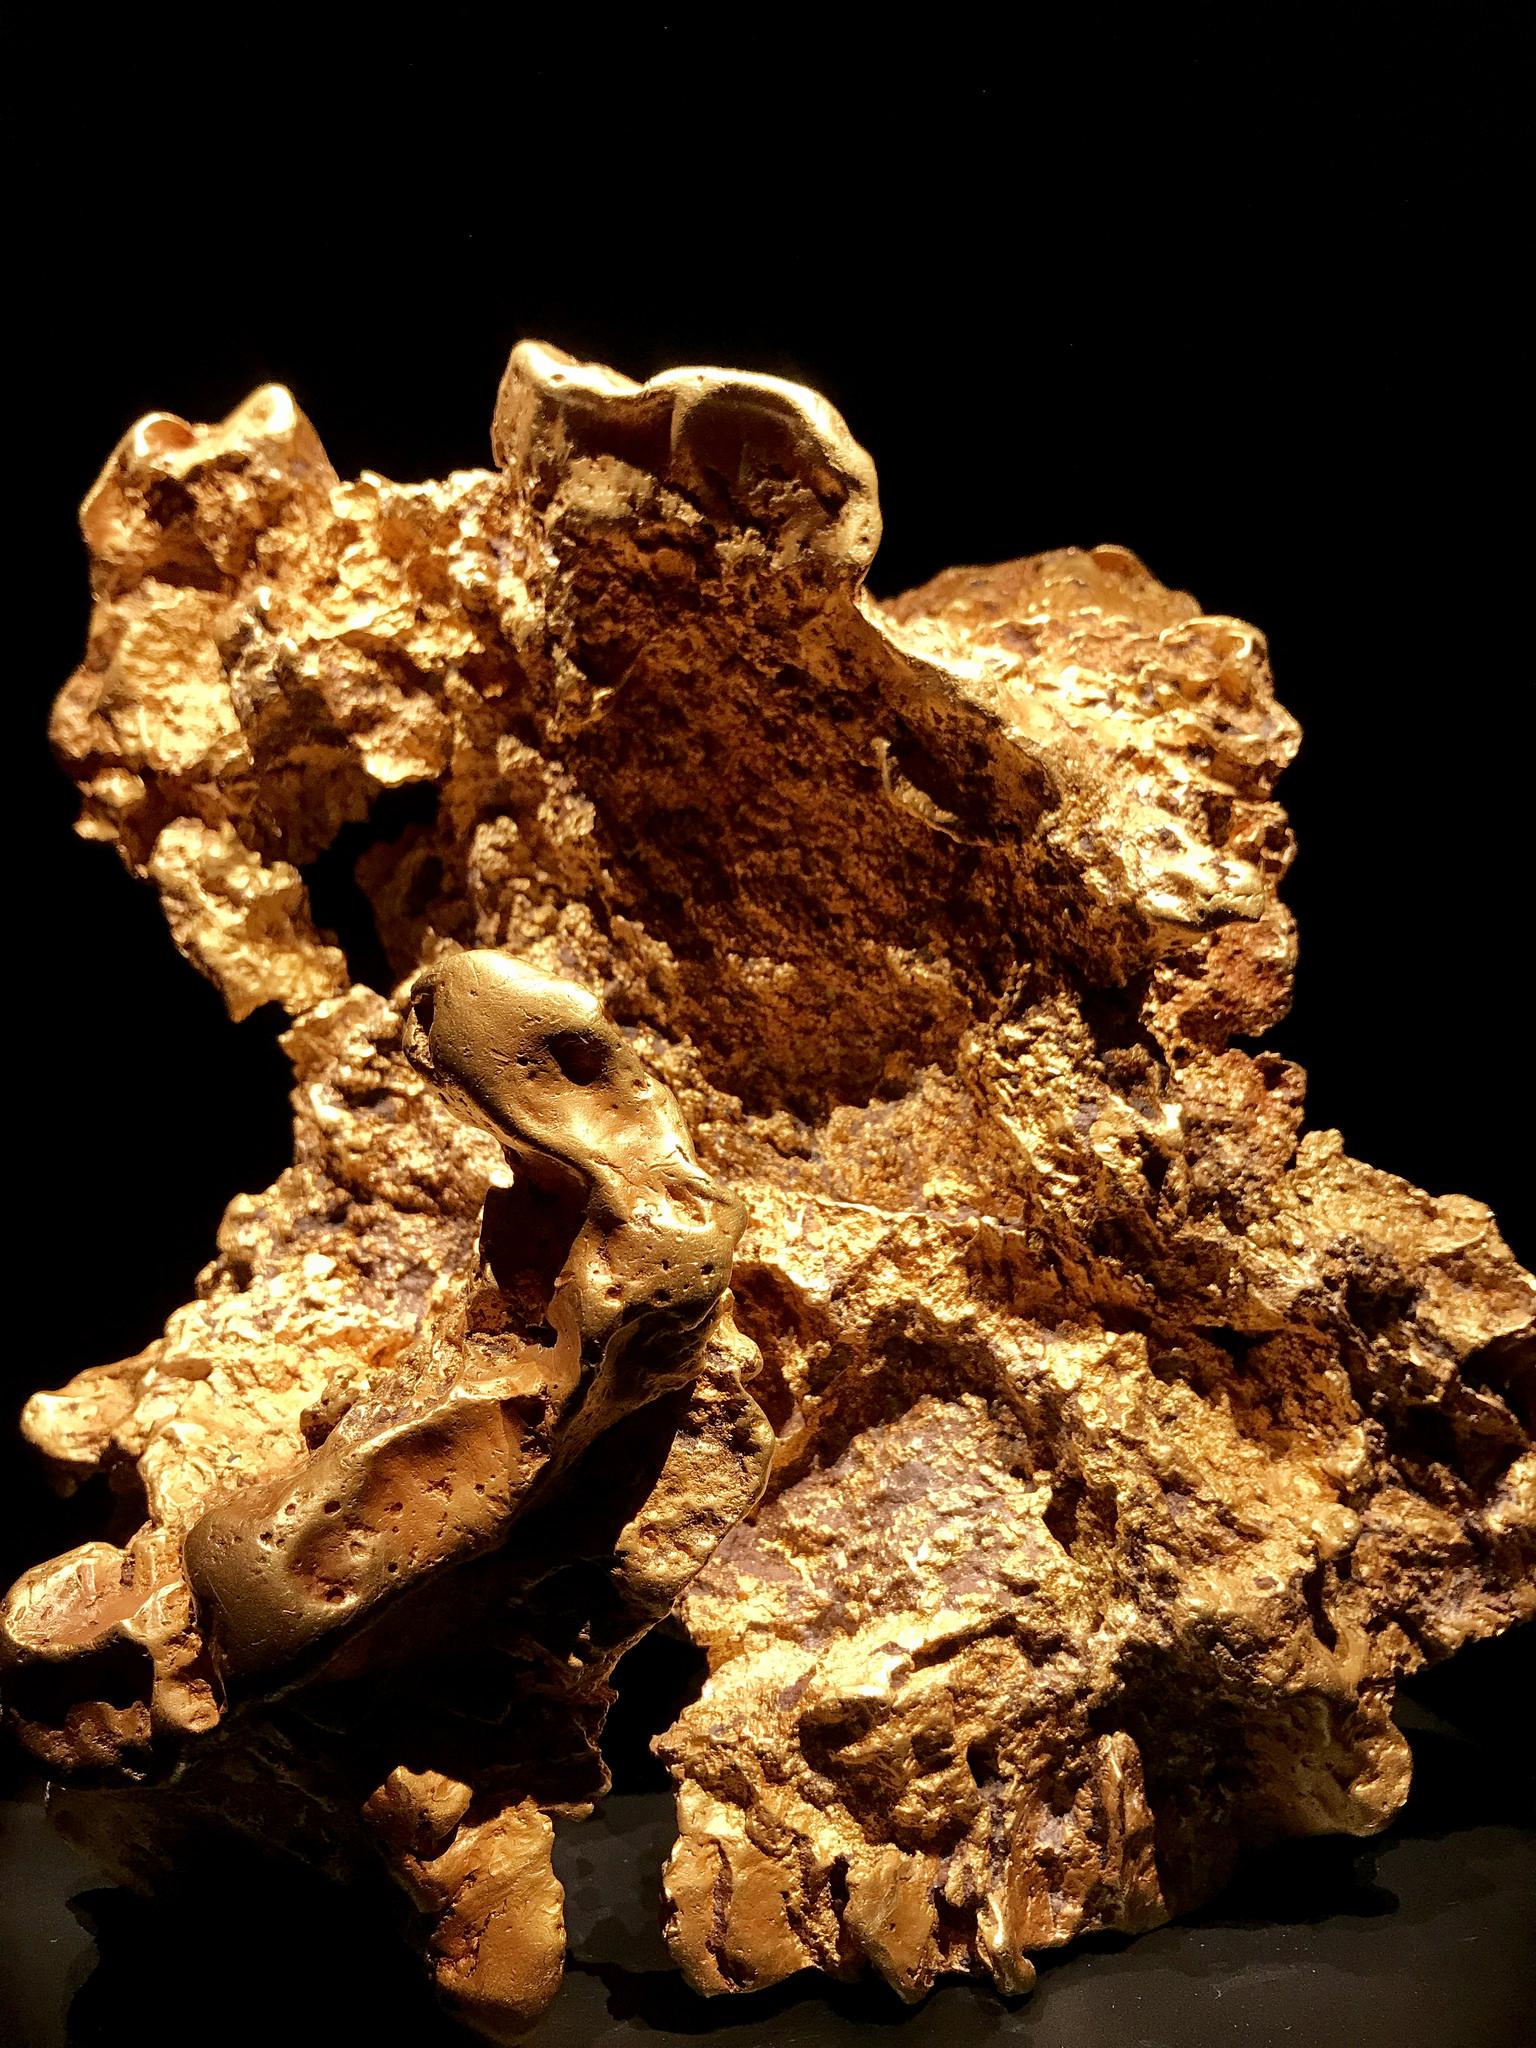 Ausrox-gold-nugget-large